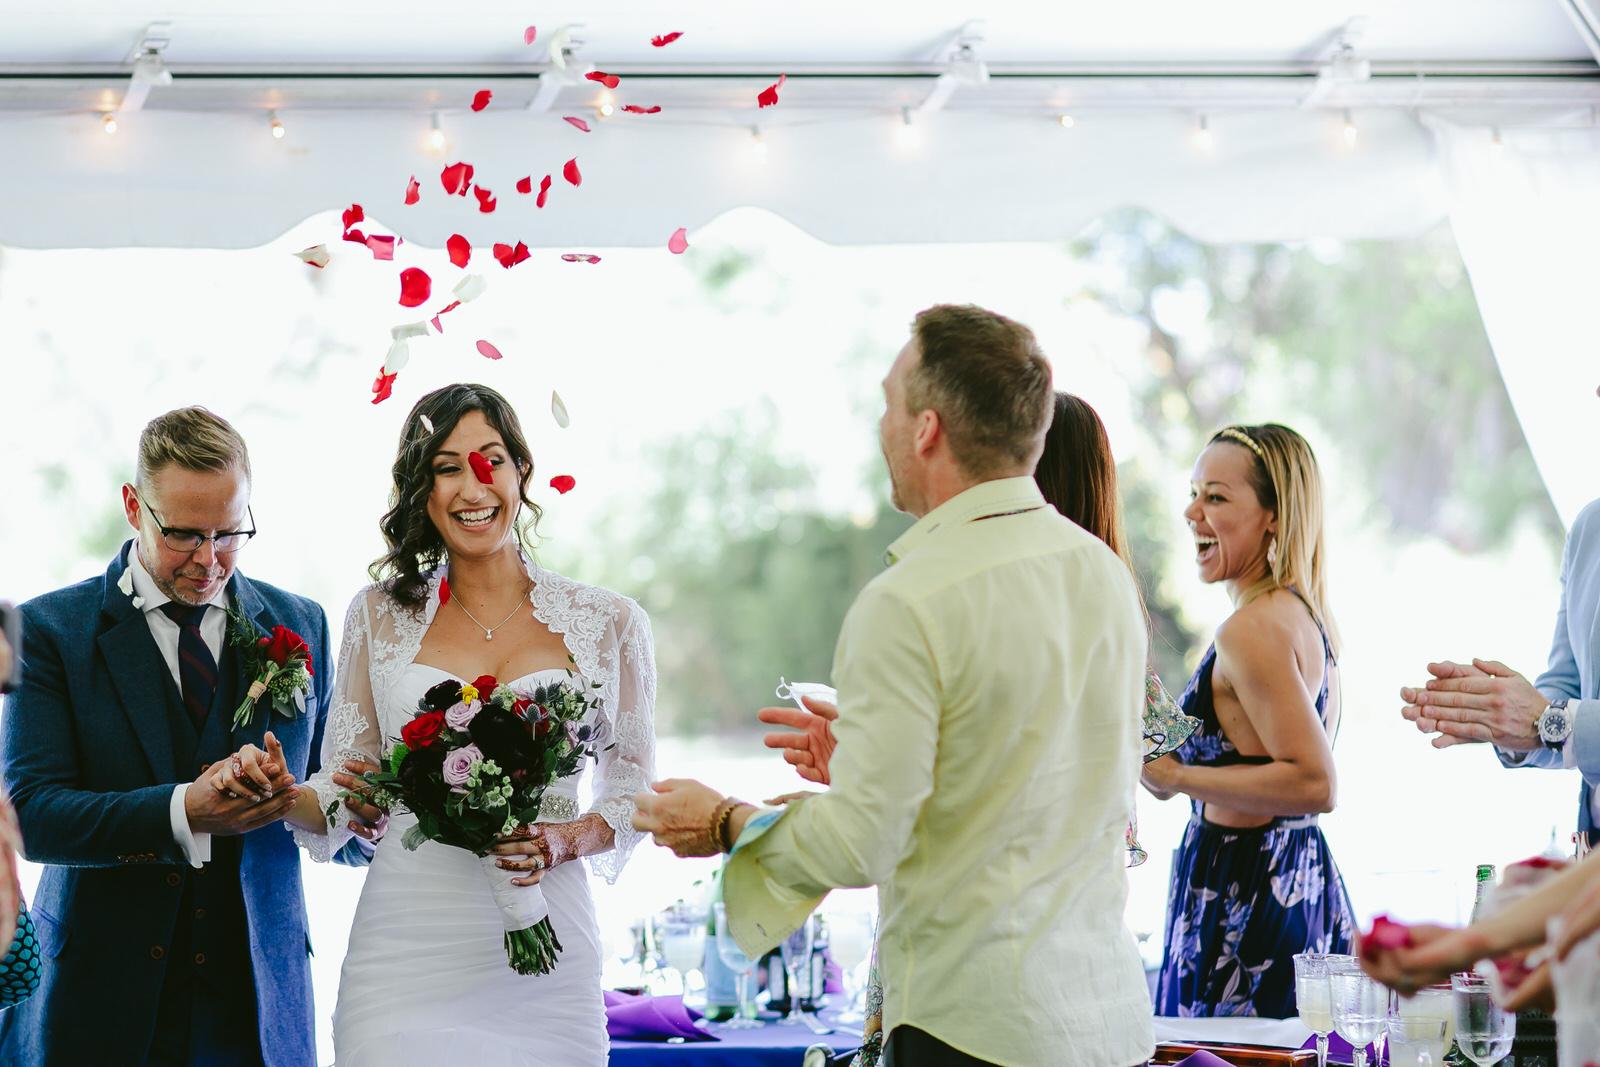 kashi-wedding-reception-tiny-house-photo-flower-bomb.jpg